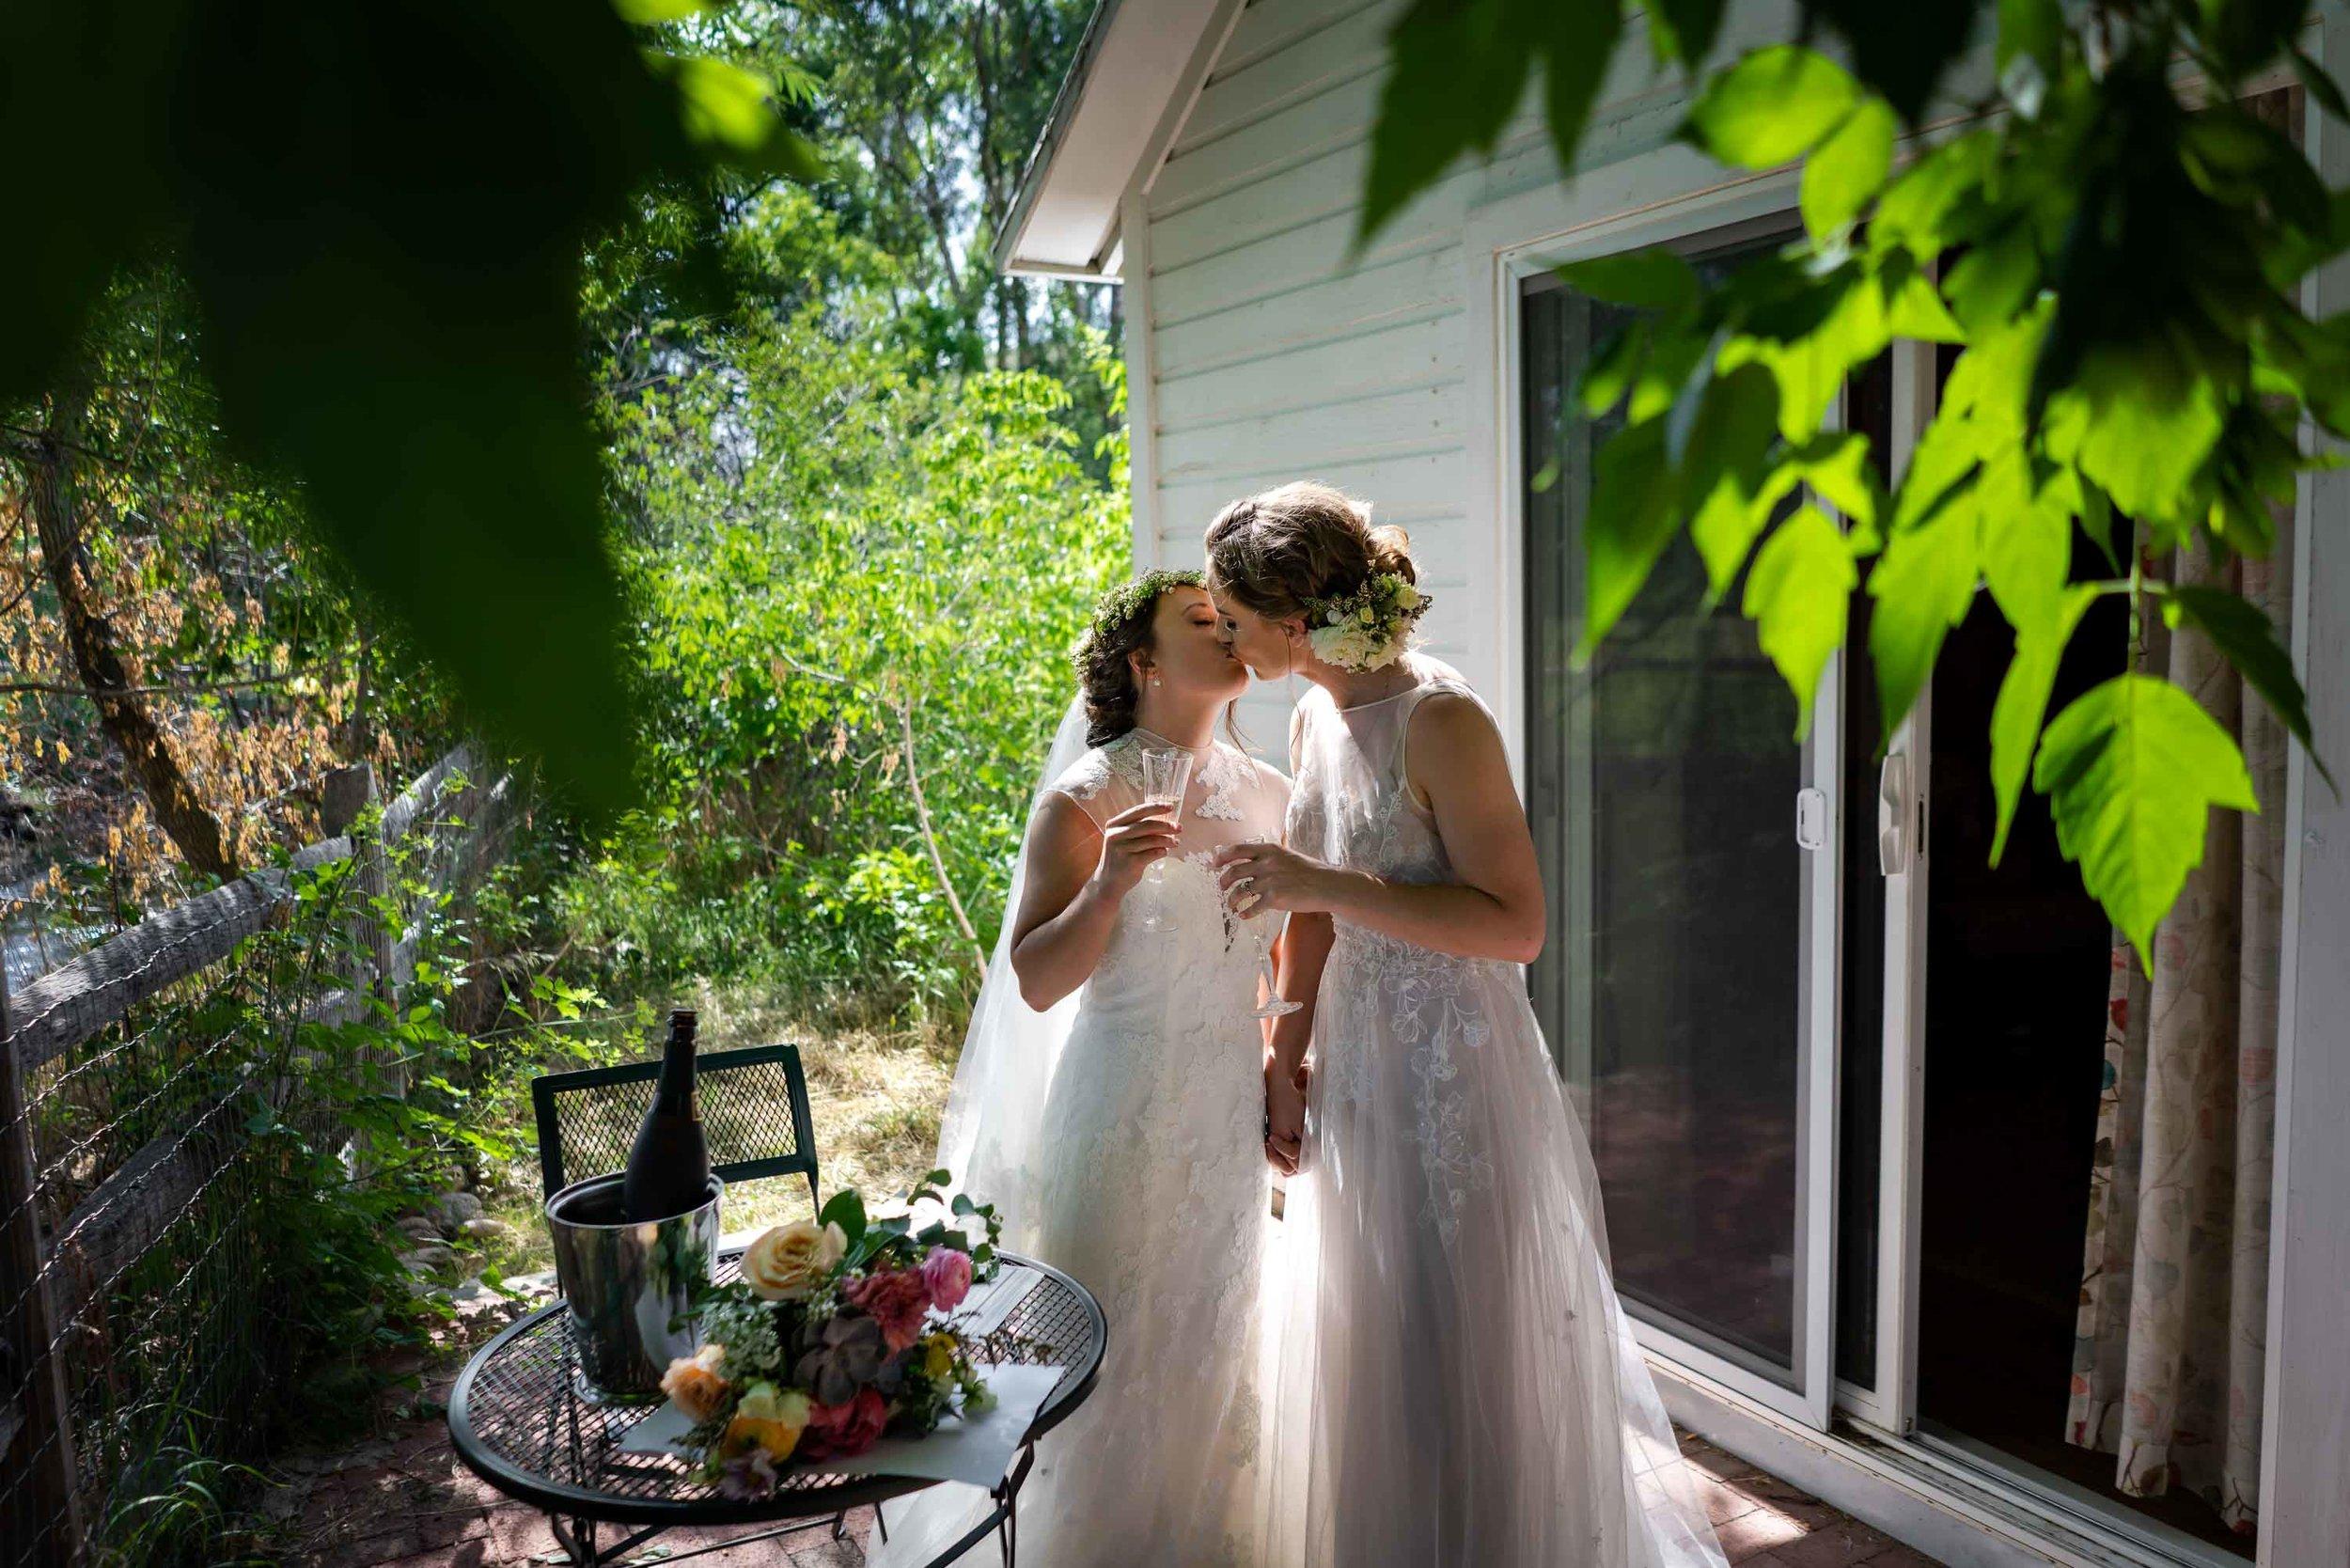 Rist_Canyon_Inn_Laporte_Wedding-110.jpg